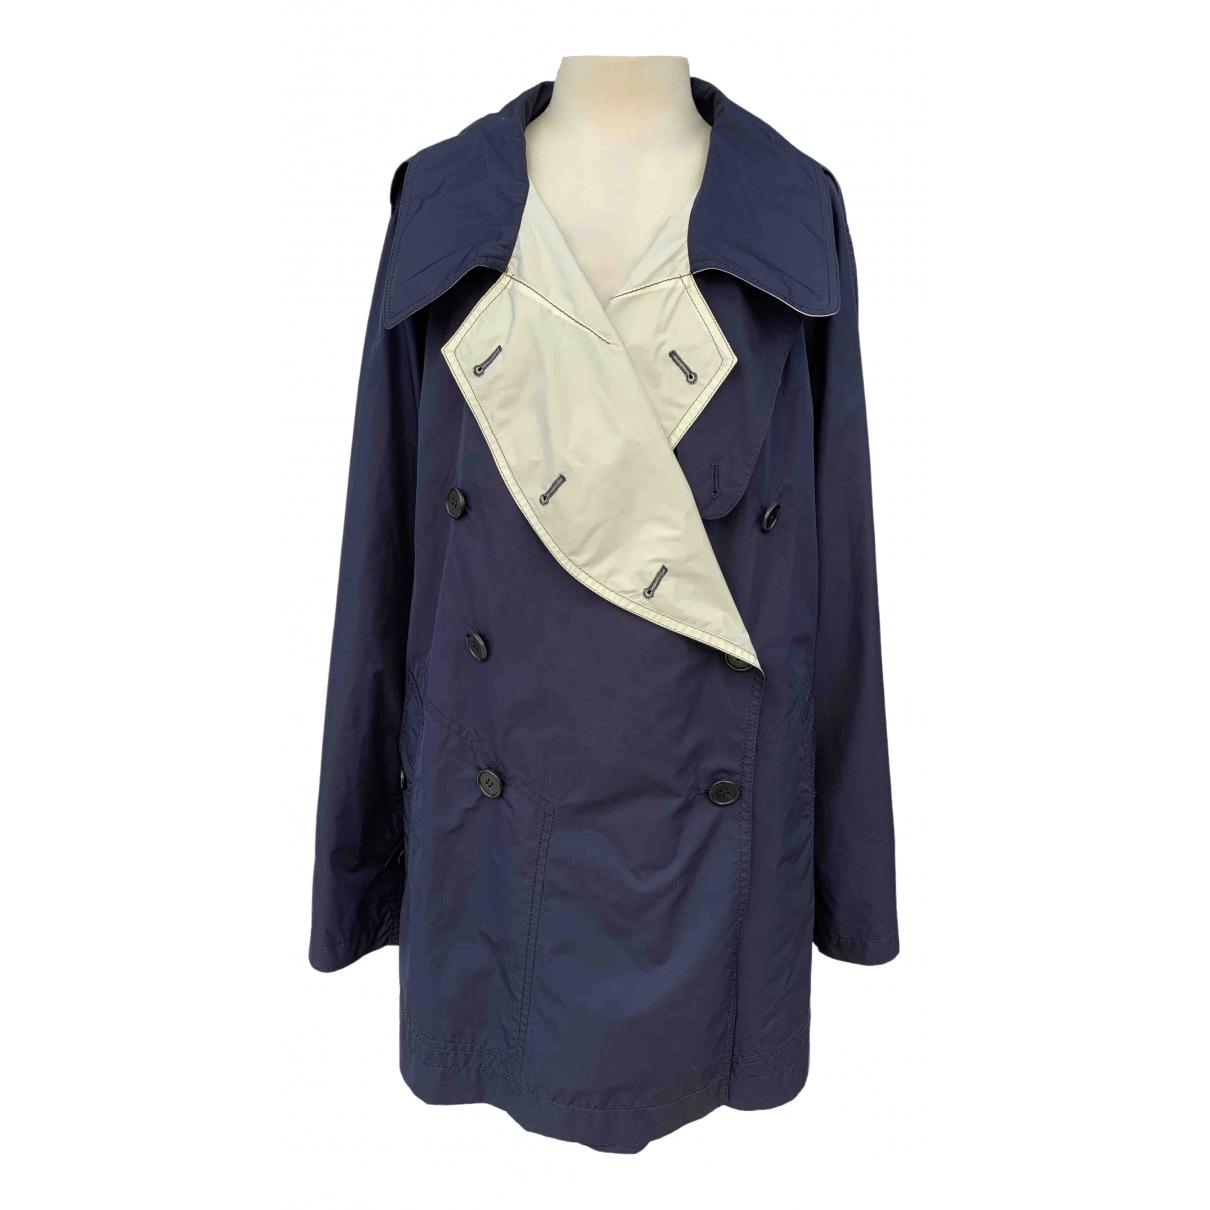 Celine \N Navy jacket for Women 38 FR